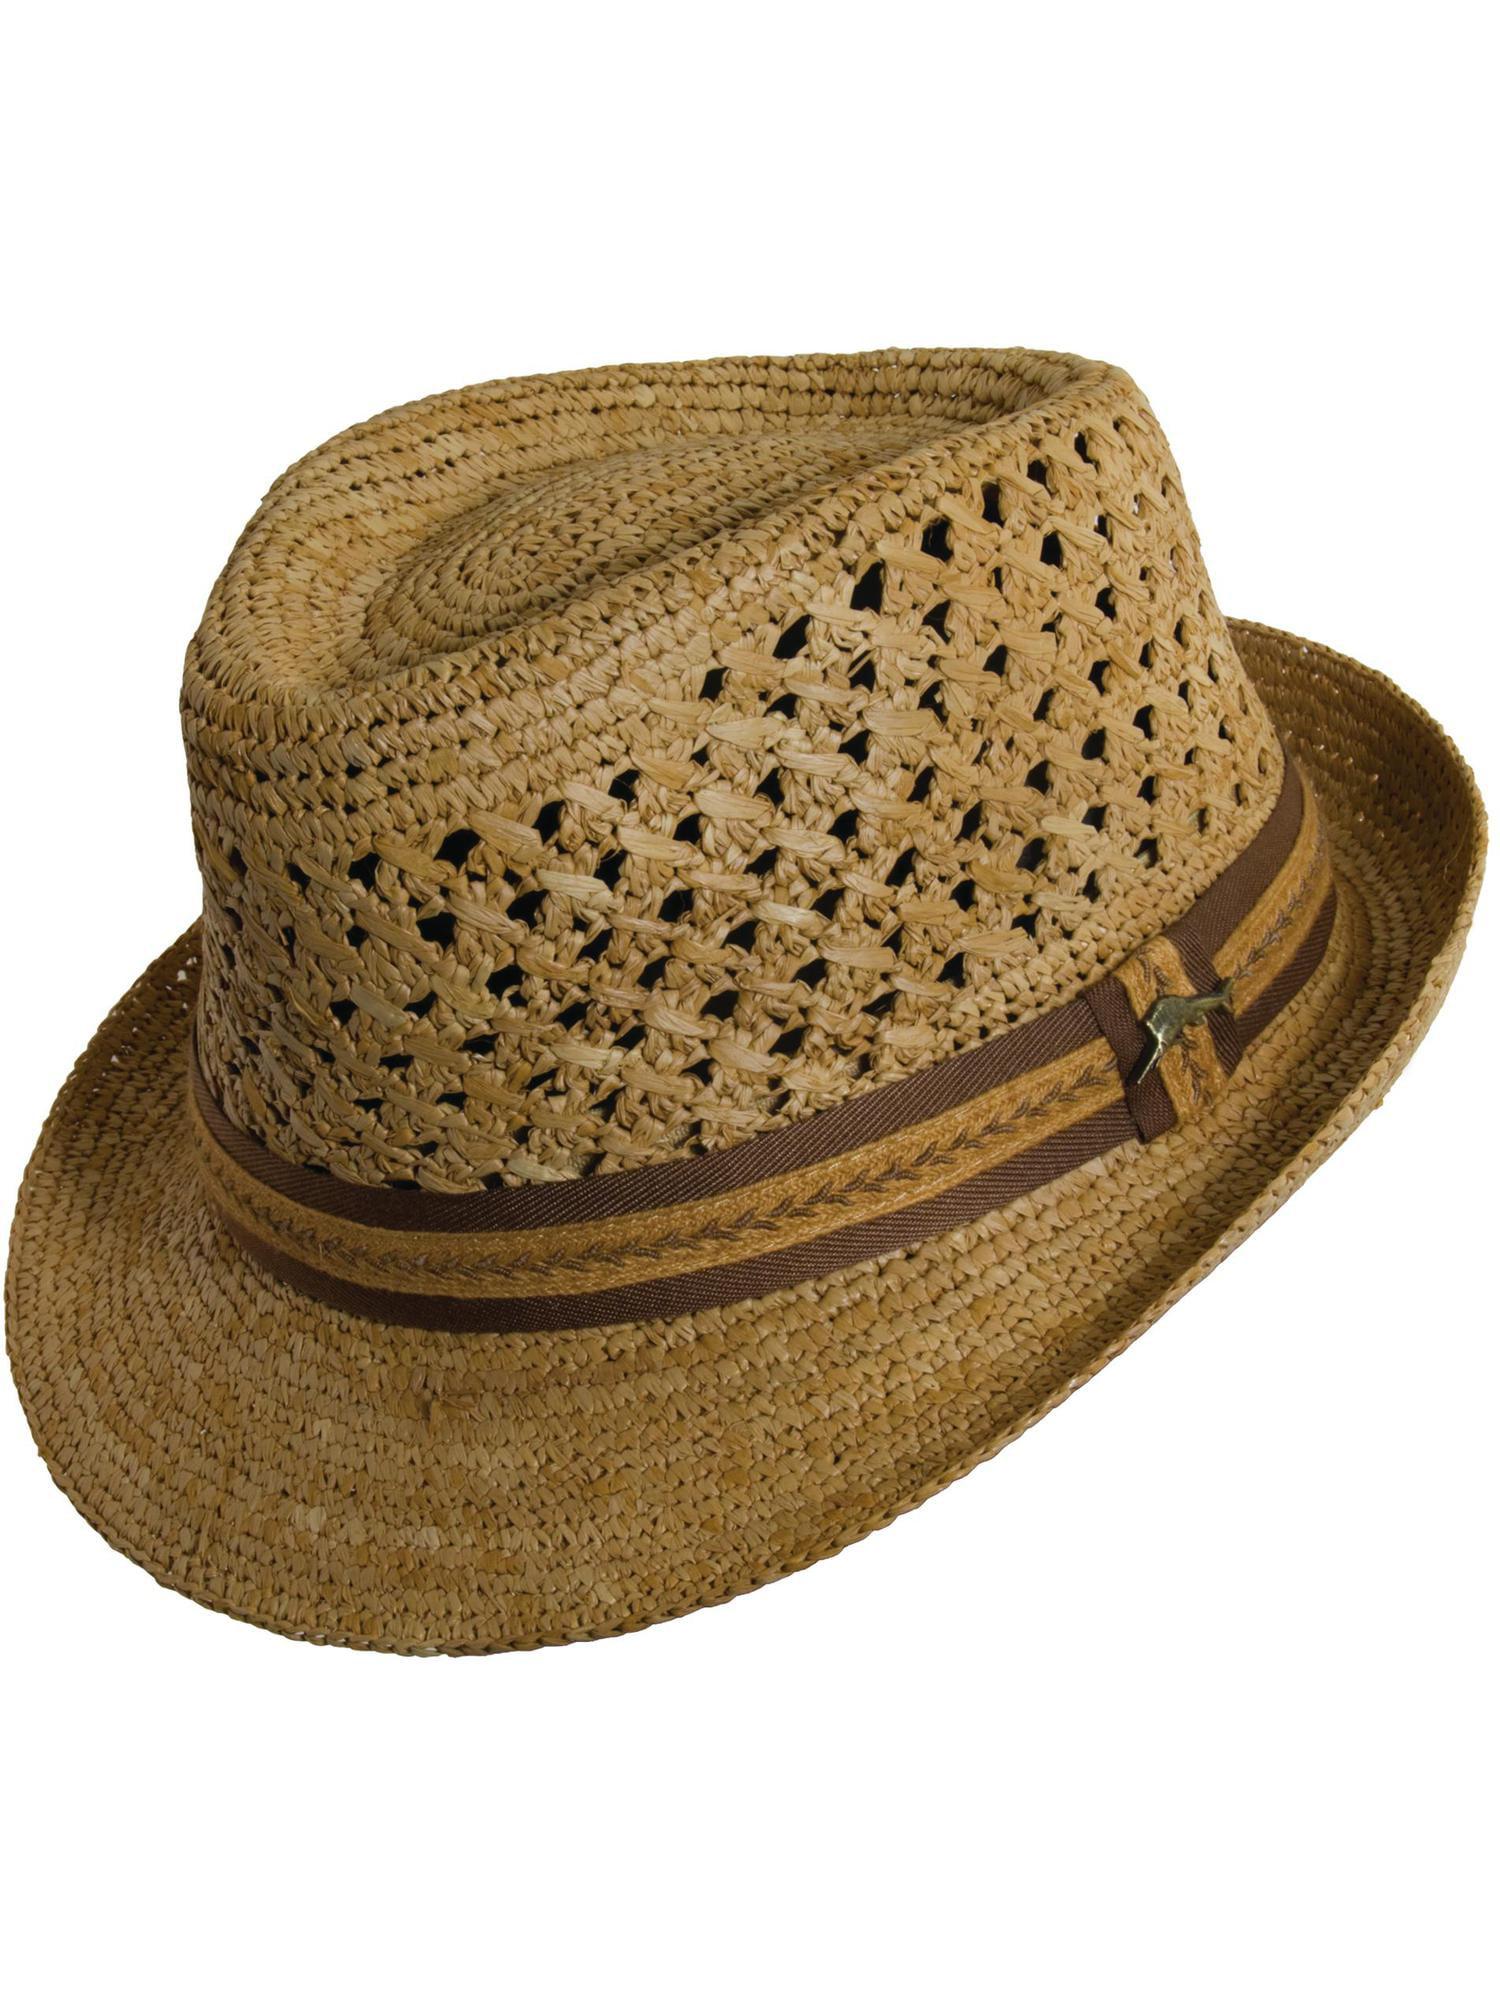 Tommy Bahama Size Small Medium Crocheted Raffia Fedora Hat, Tea by Tommy Bahama